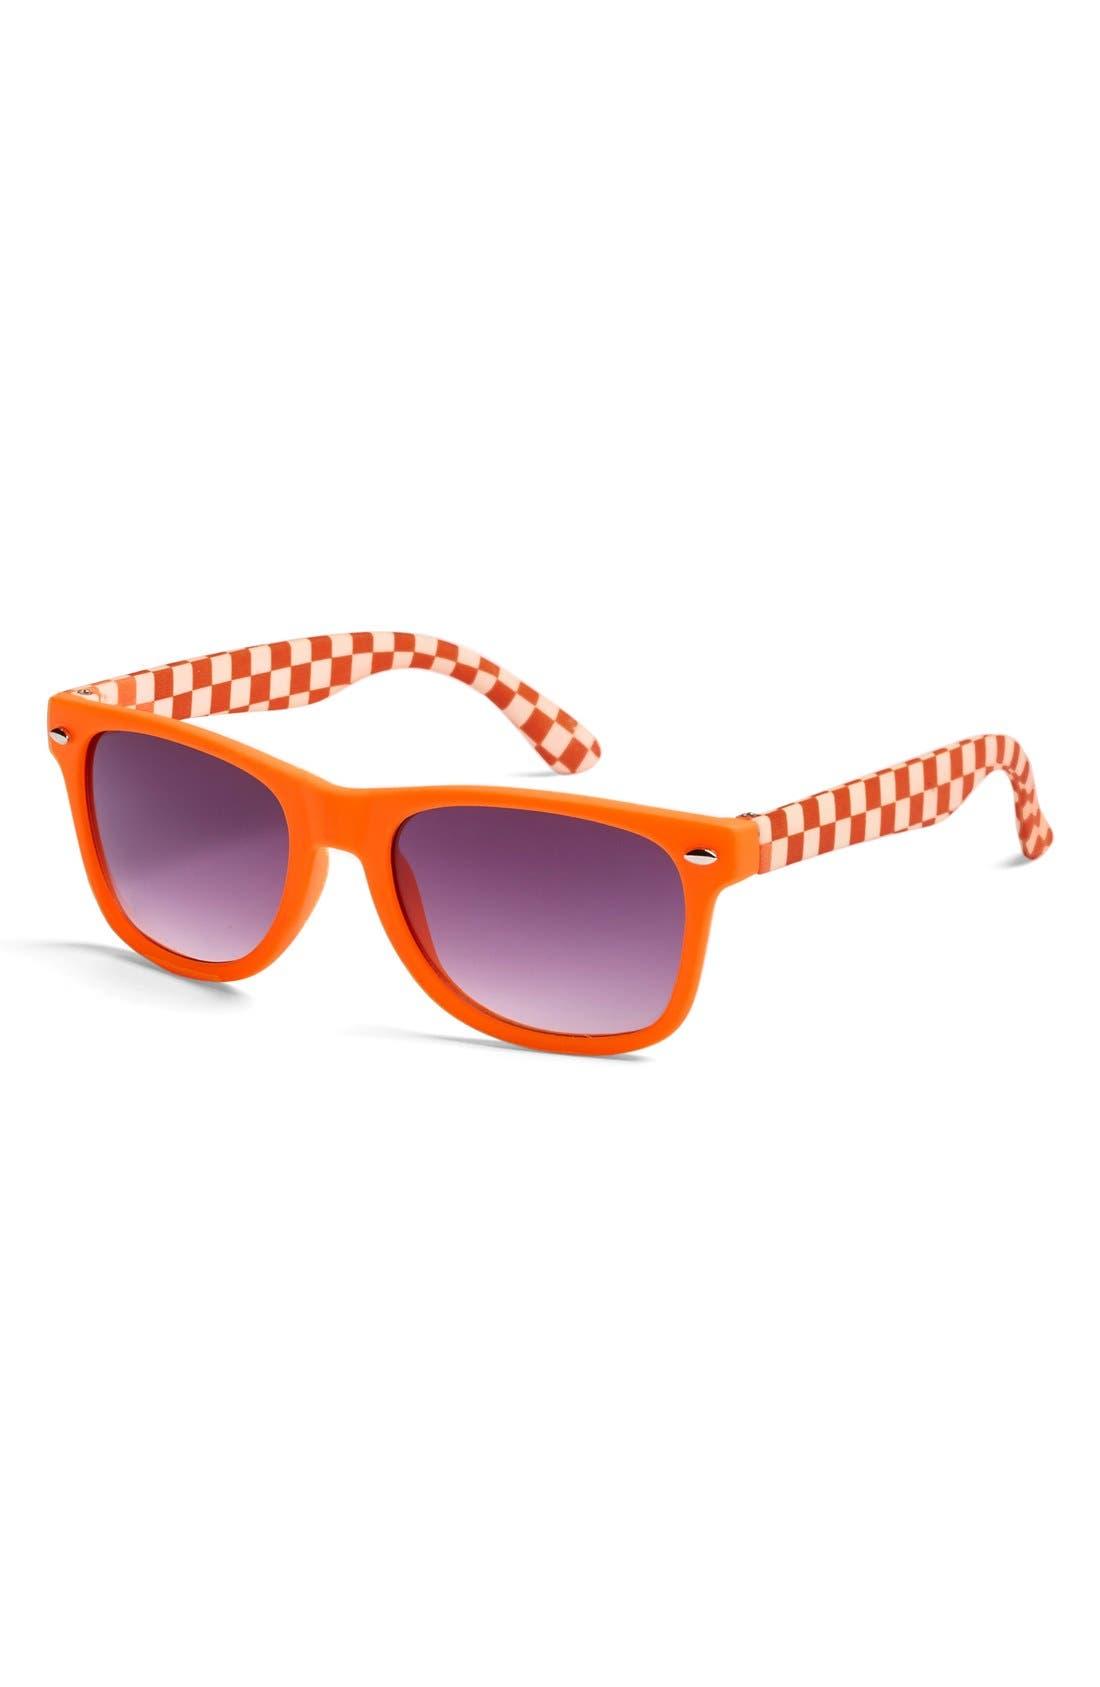 Alternate Image 1 Selected - Loose Leaf Eyewear Retro Sunglasses (Toddler Boys)